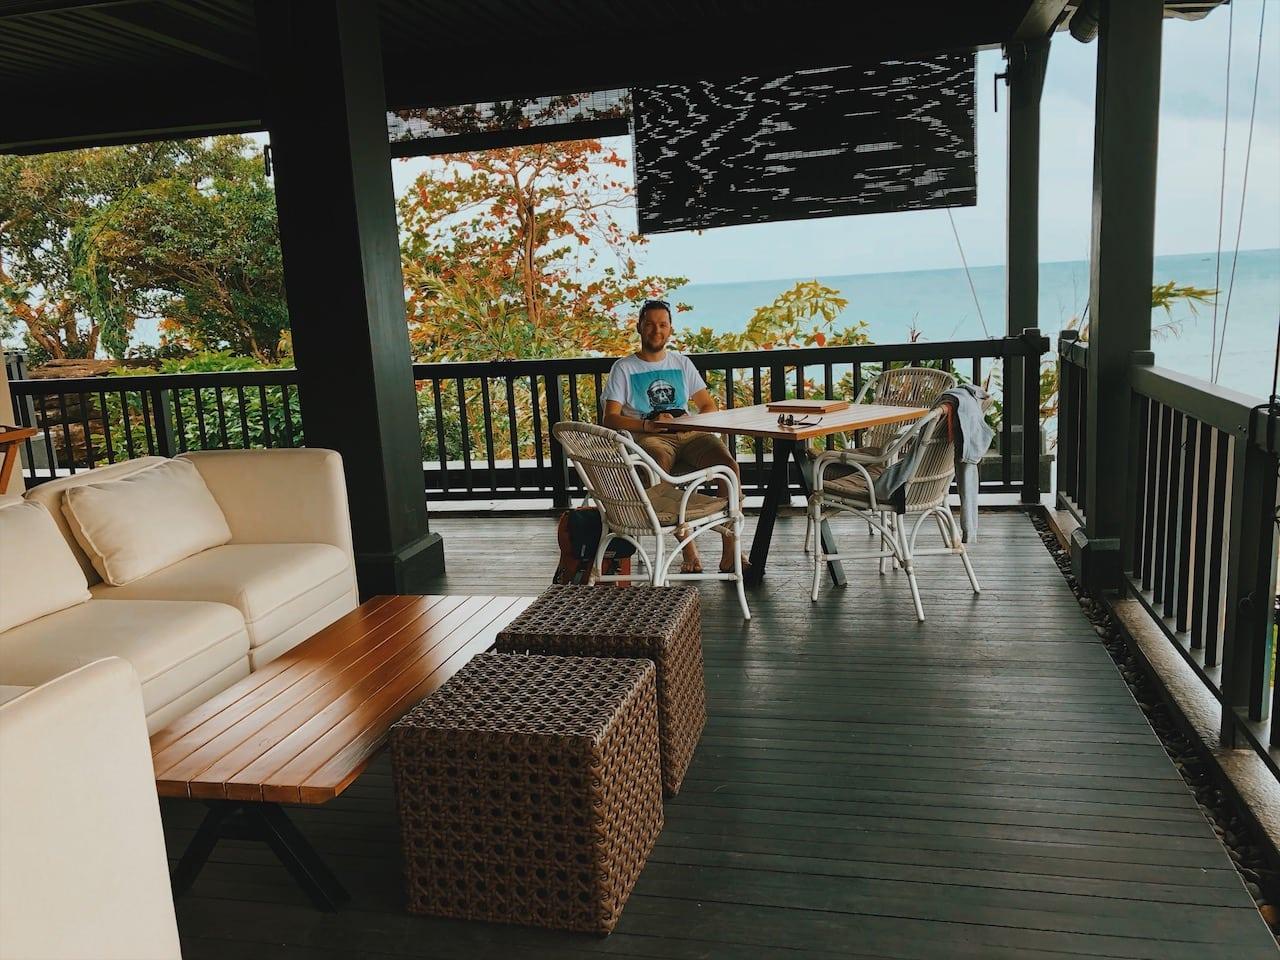 hon mong tay hotel, kawa wyspa phu quoc wietnam neverendingtravel.pl